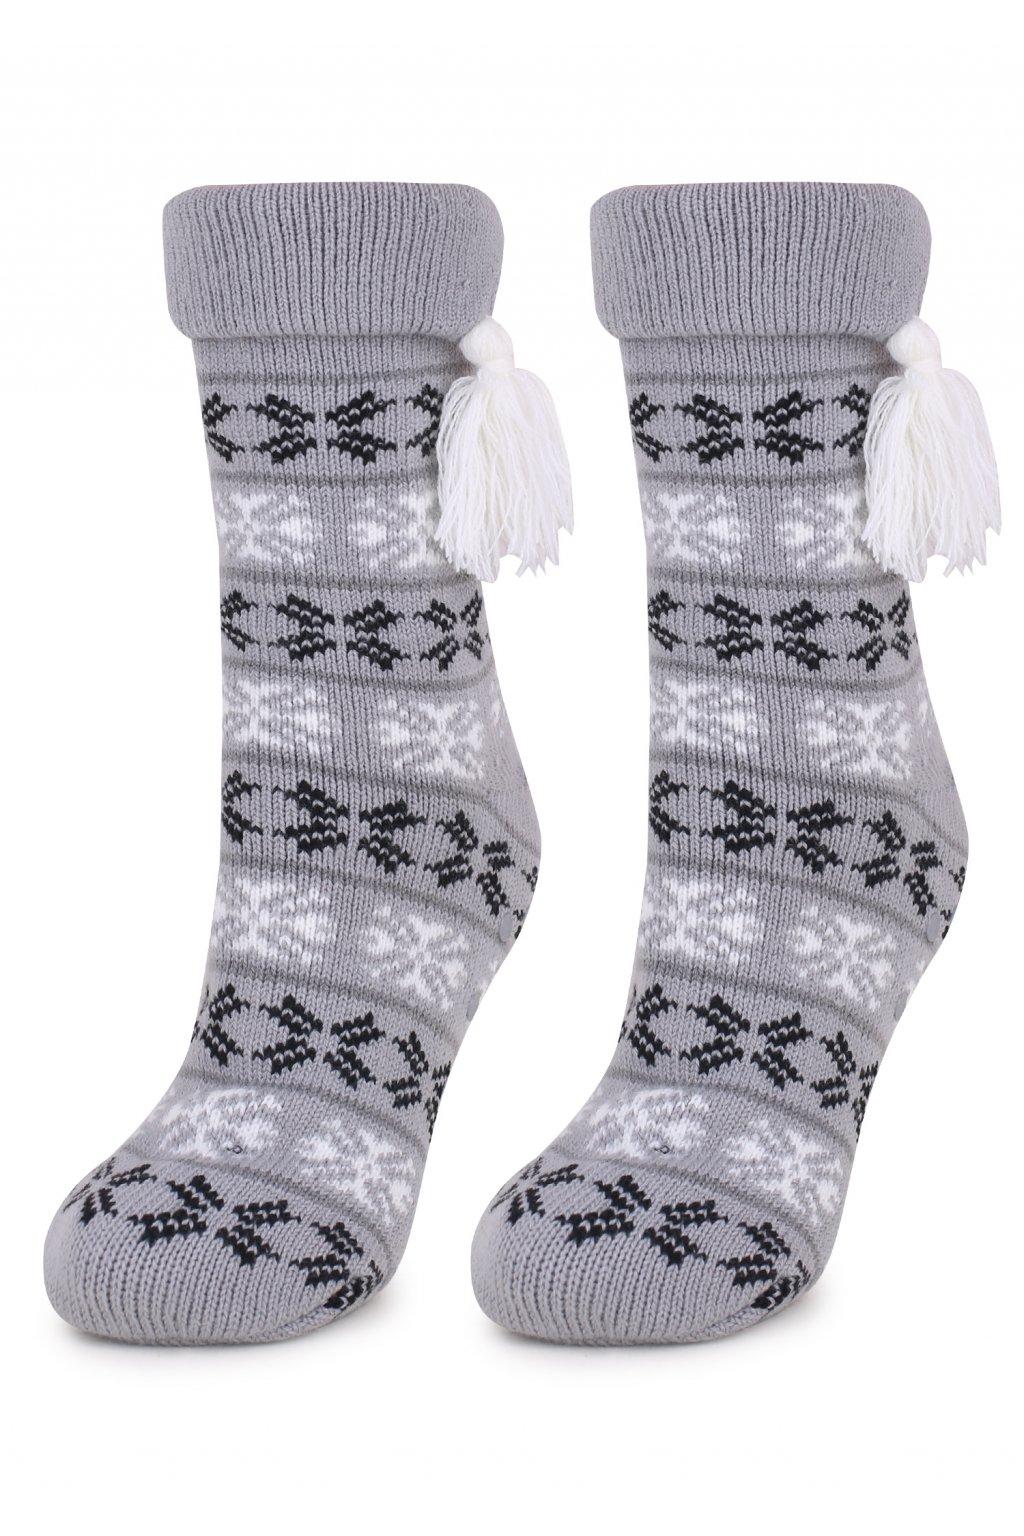 Ponožky TERRY N48 ABS